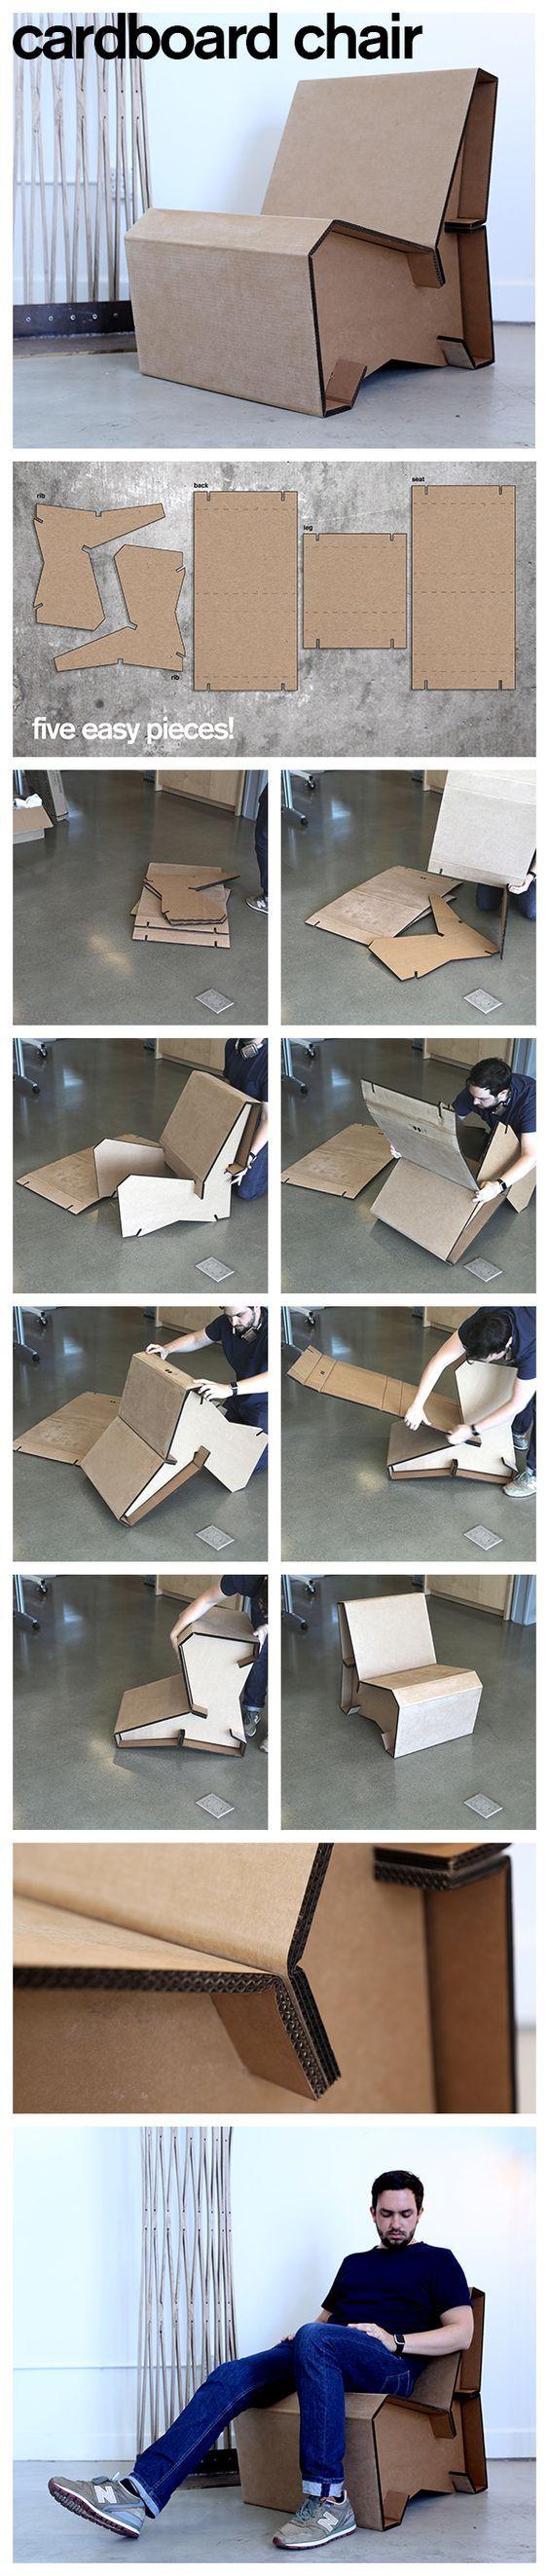 26 DIY Cardboard Furniture Ideas That Are